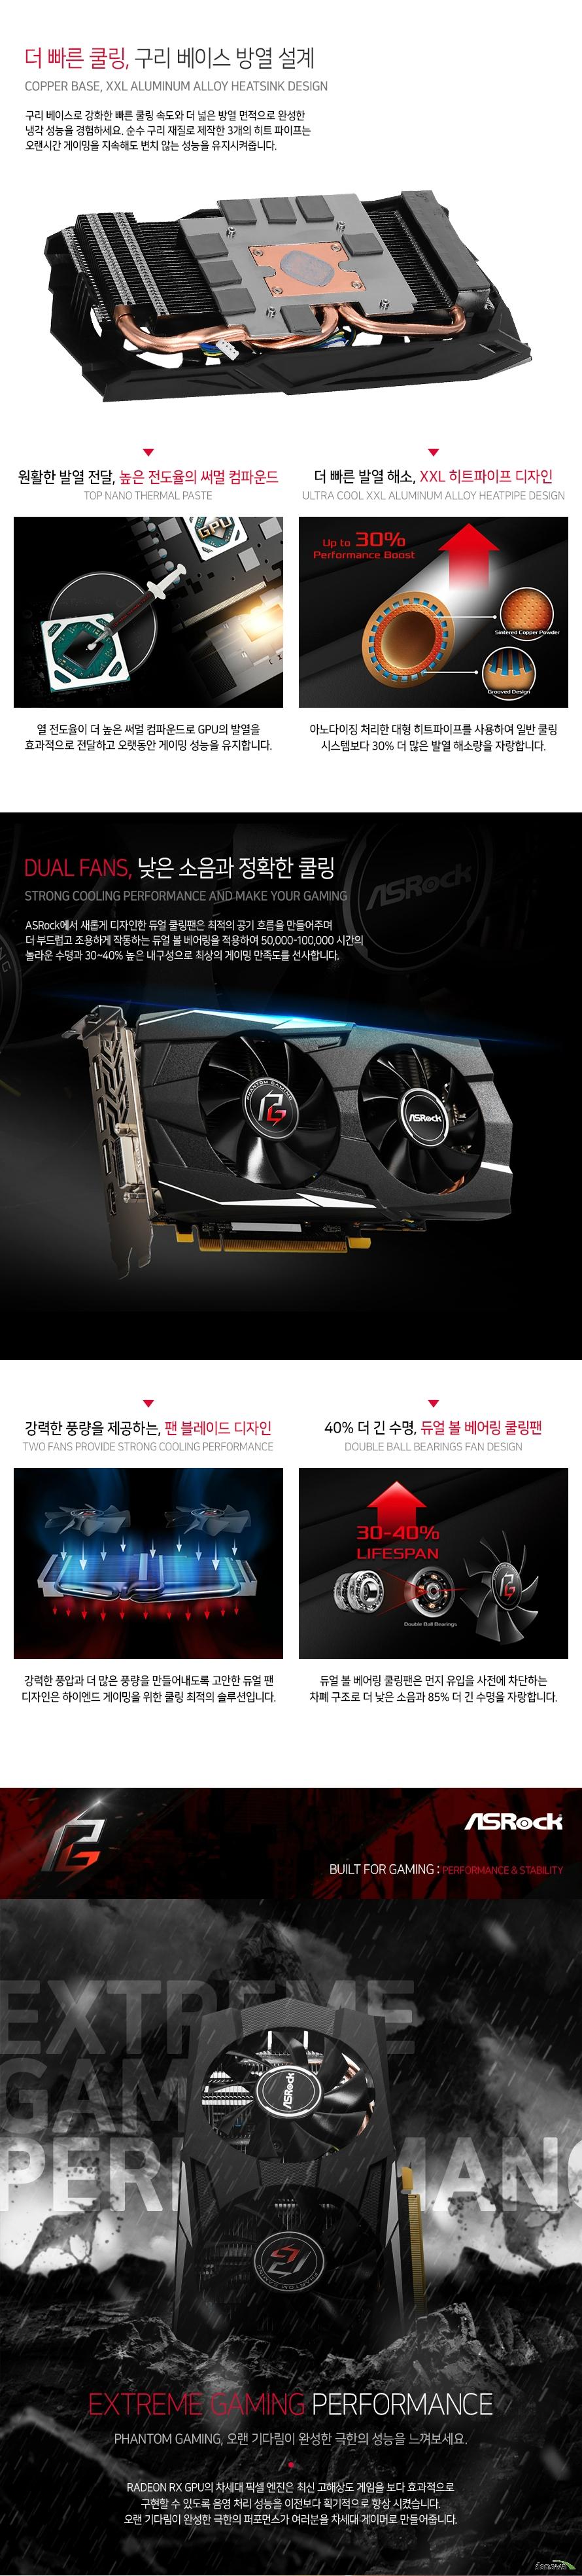 ASRock Phantom Gaming D 라데온 RX 580 OC D5 8GB 에즈윈